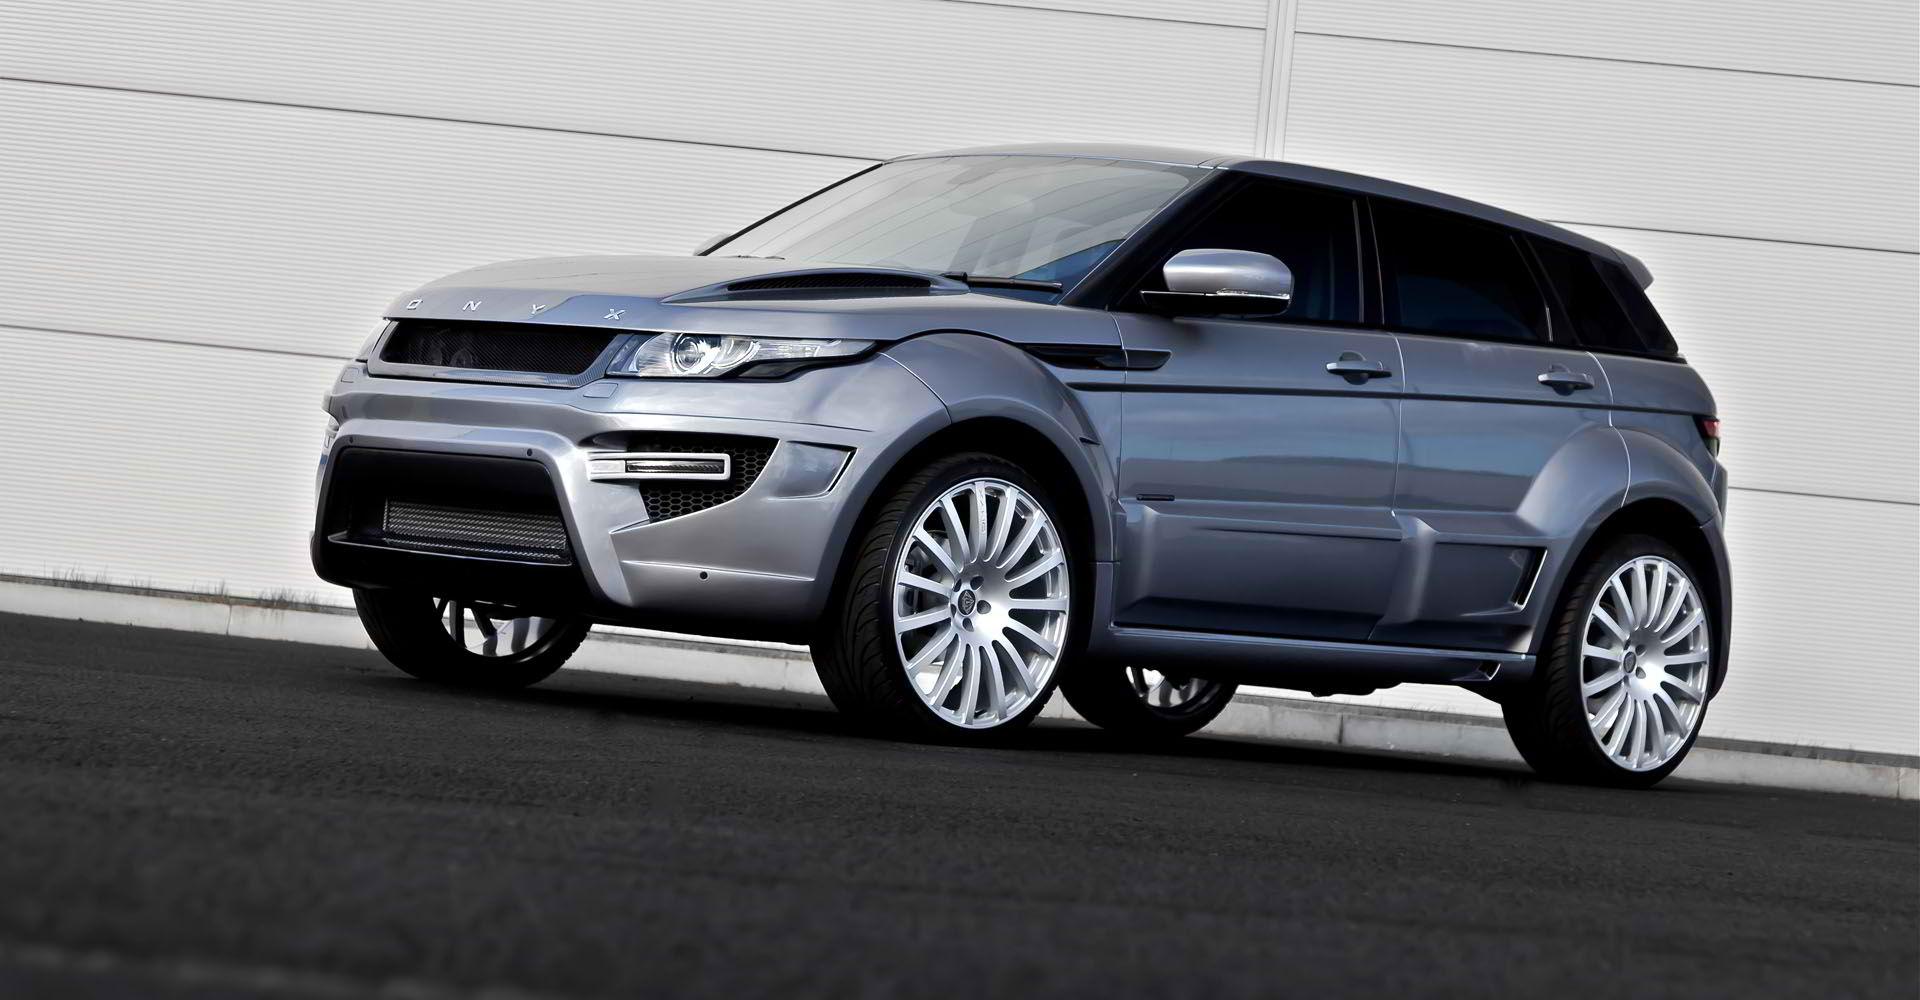 2014 onyx range rover evoque rogue body kit. Black Bedroom Furniture Sets. Home Design Ideas